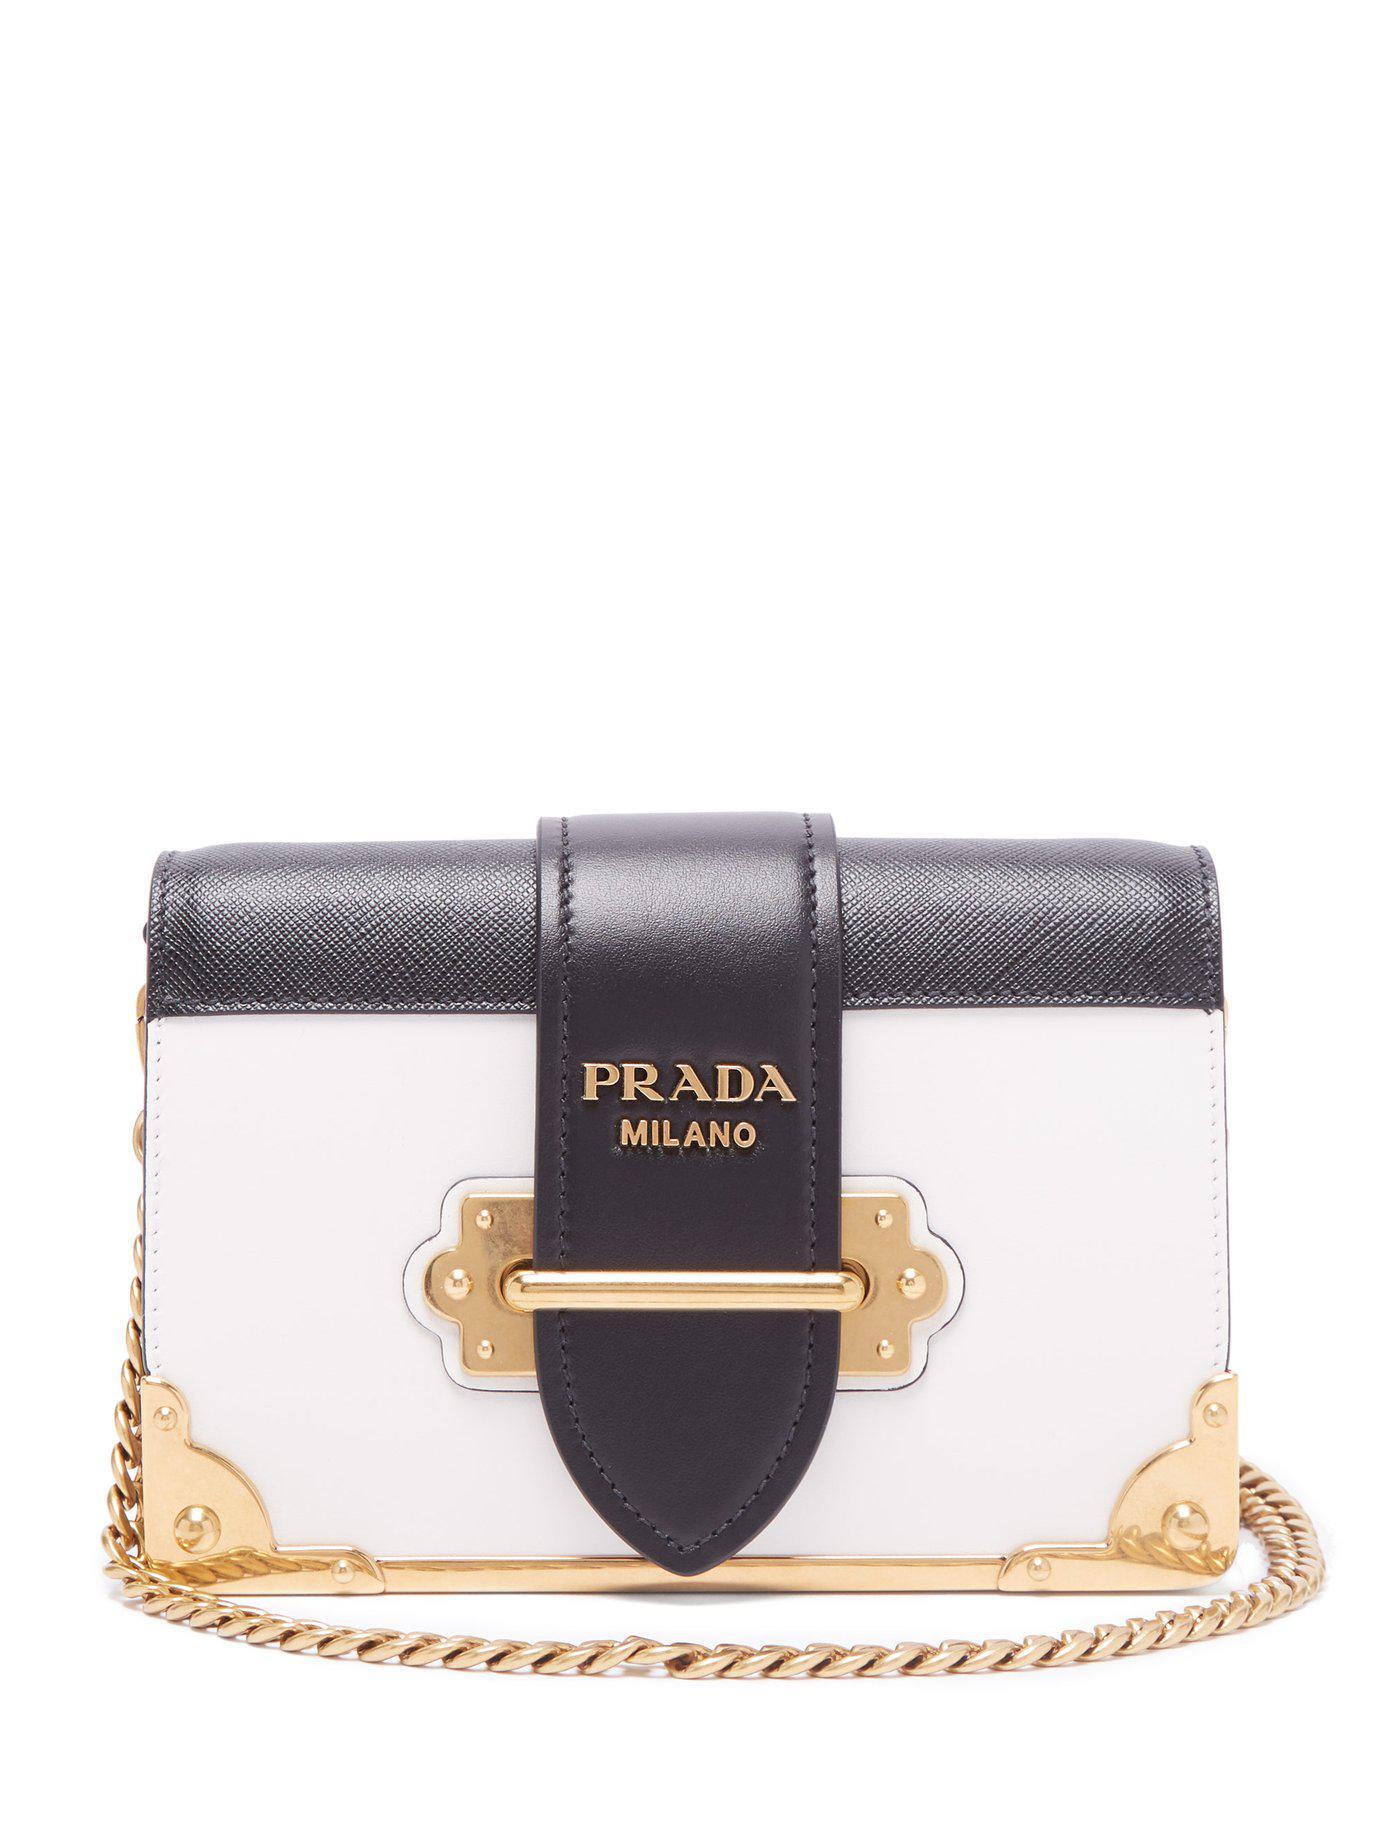 1e422c1fa401 Prada Cahier Leather Cross Body Bag - Save 18% - Lyst